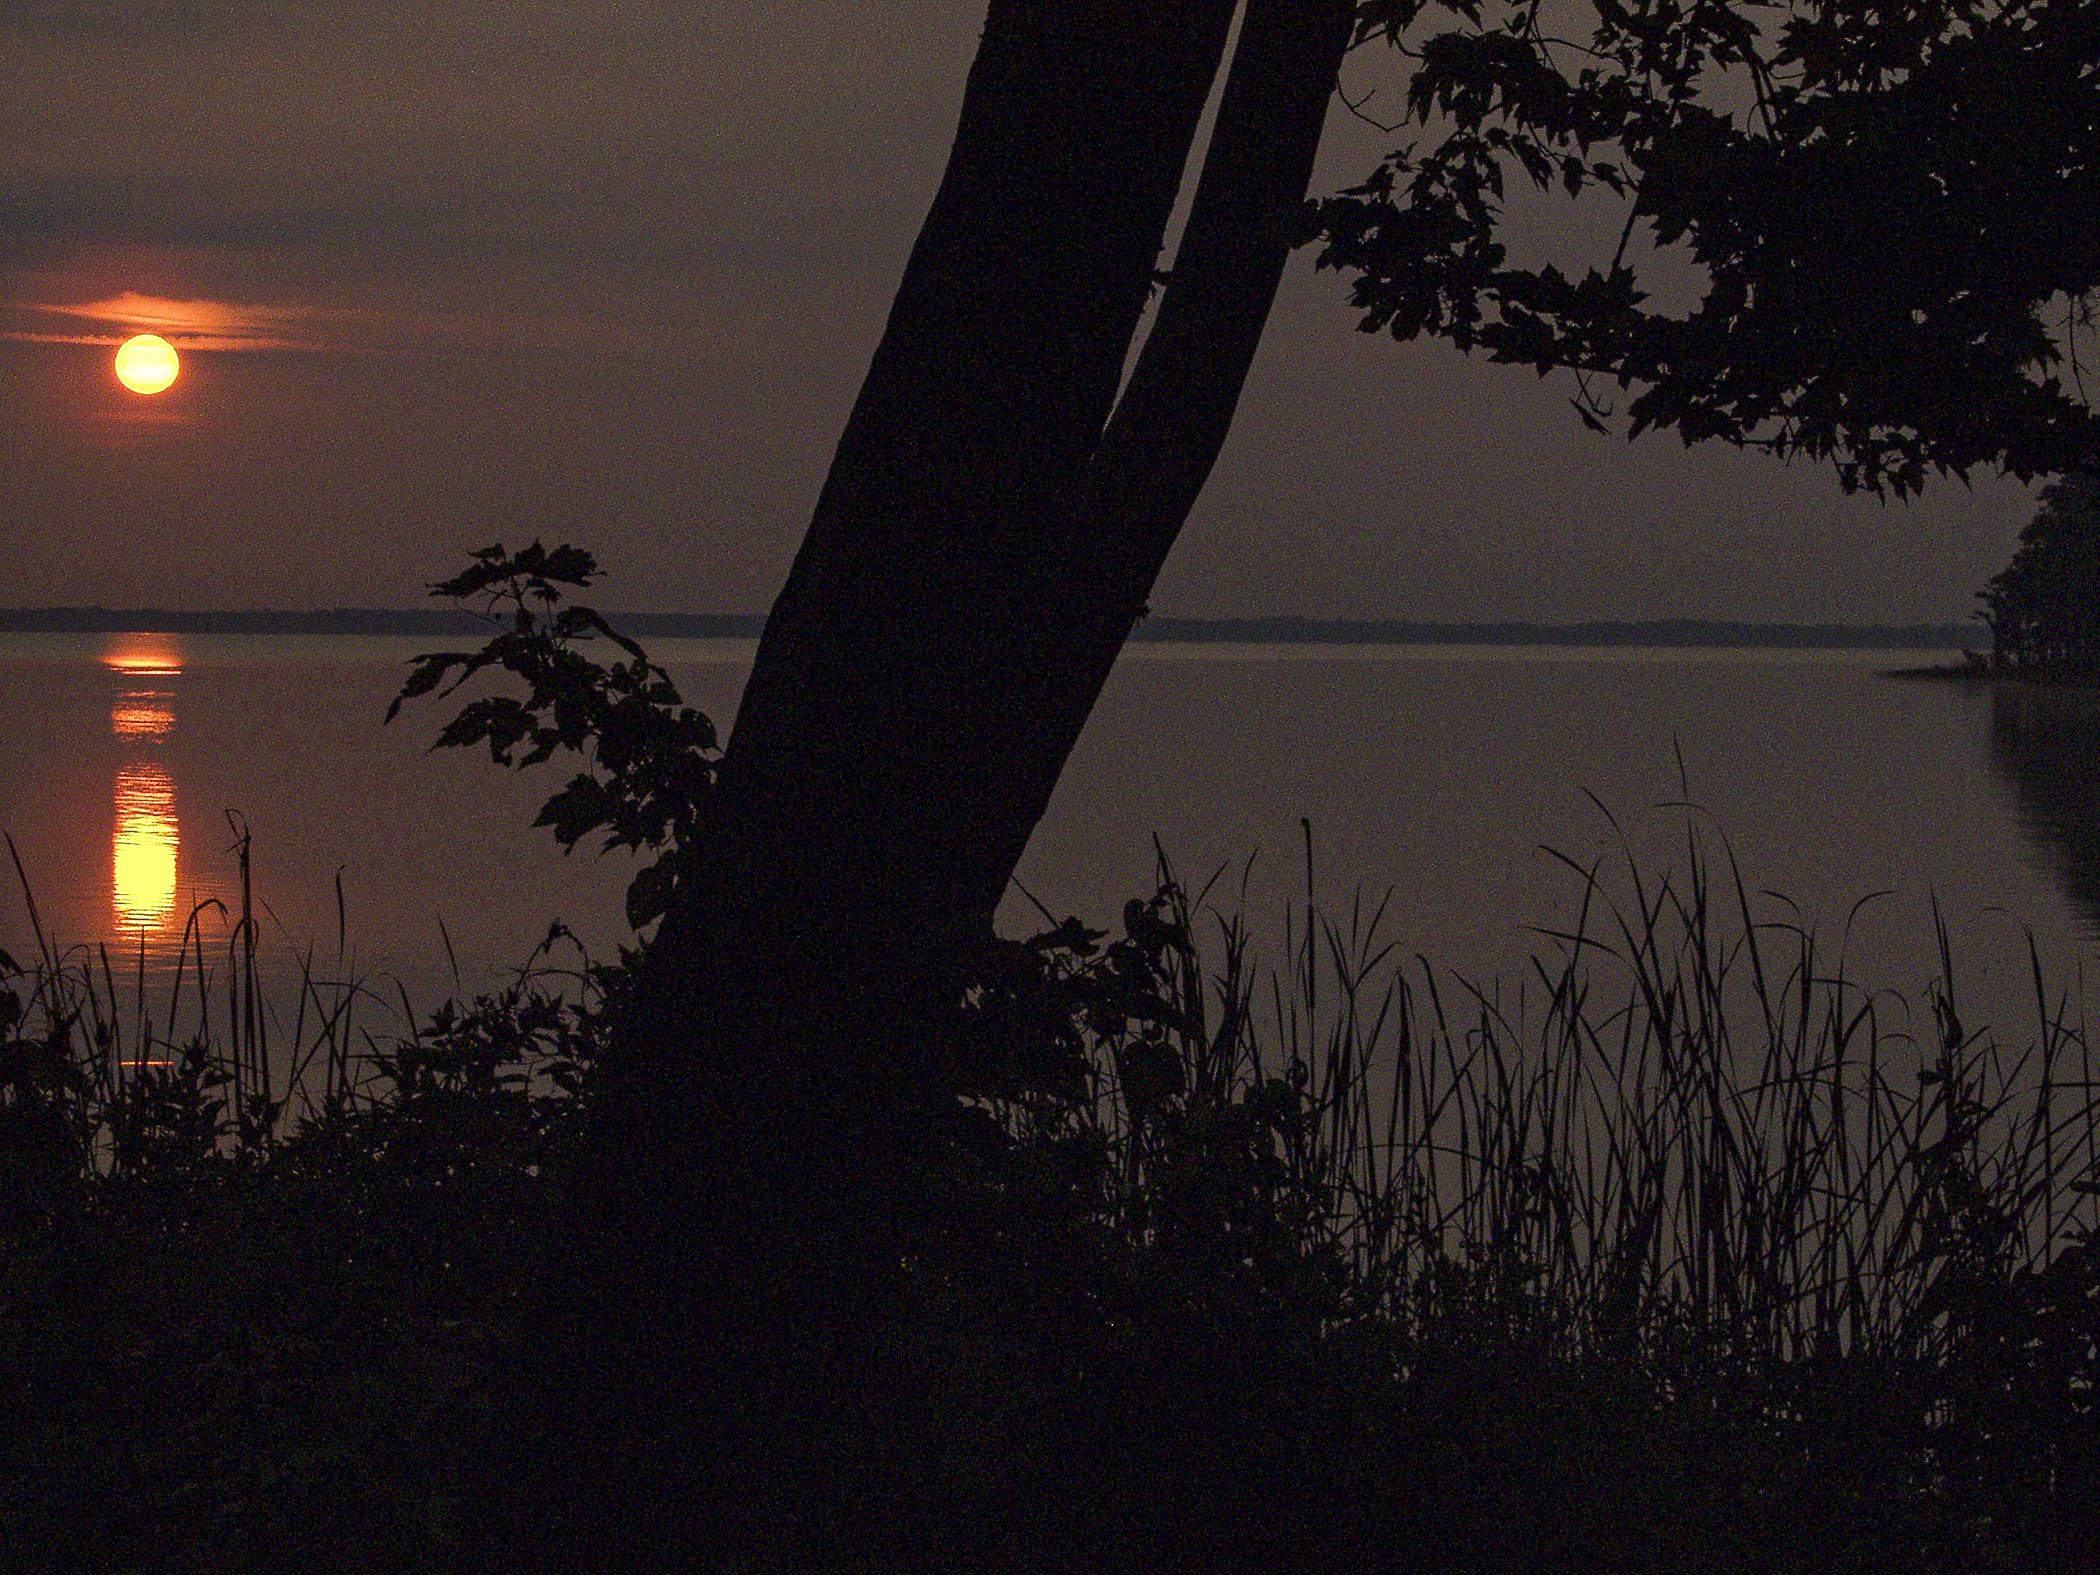 Moonlight-on-the-Lake